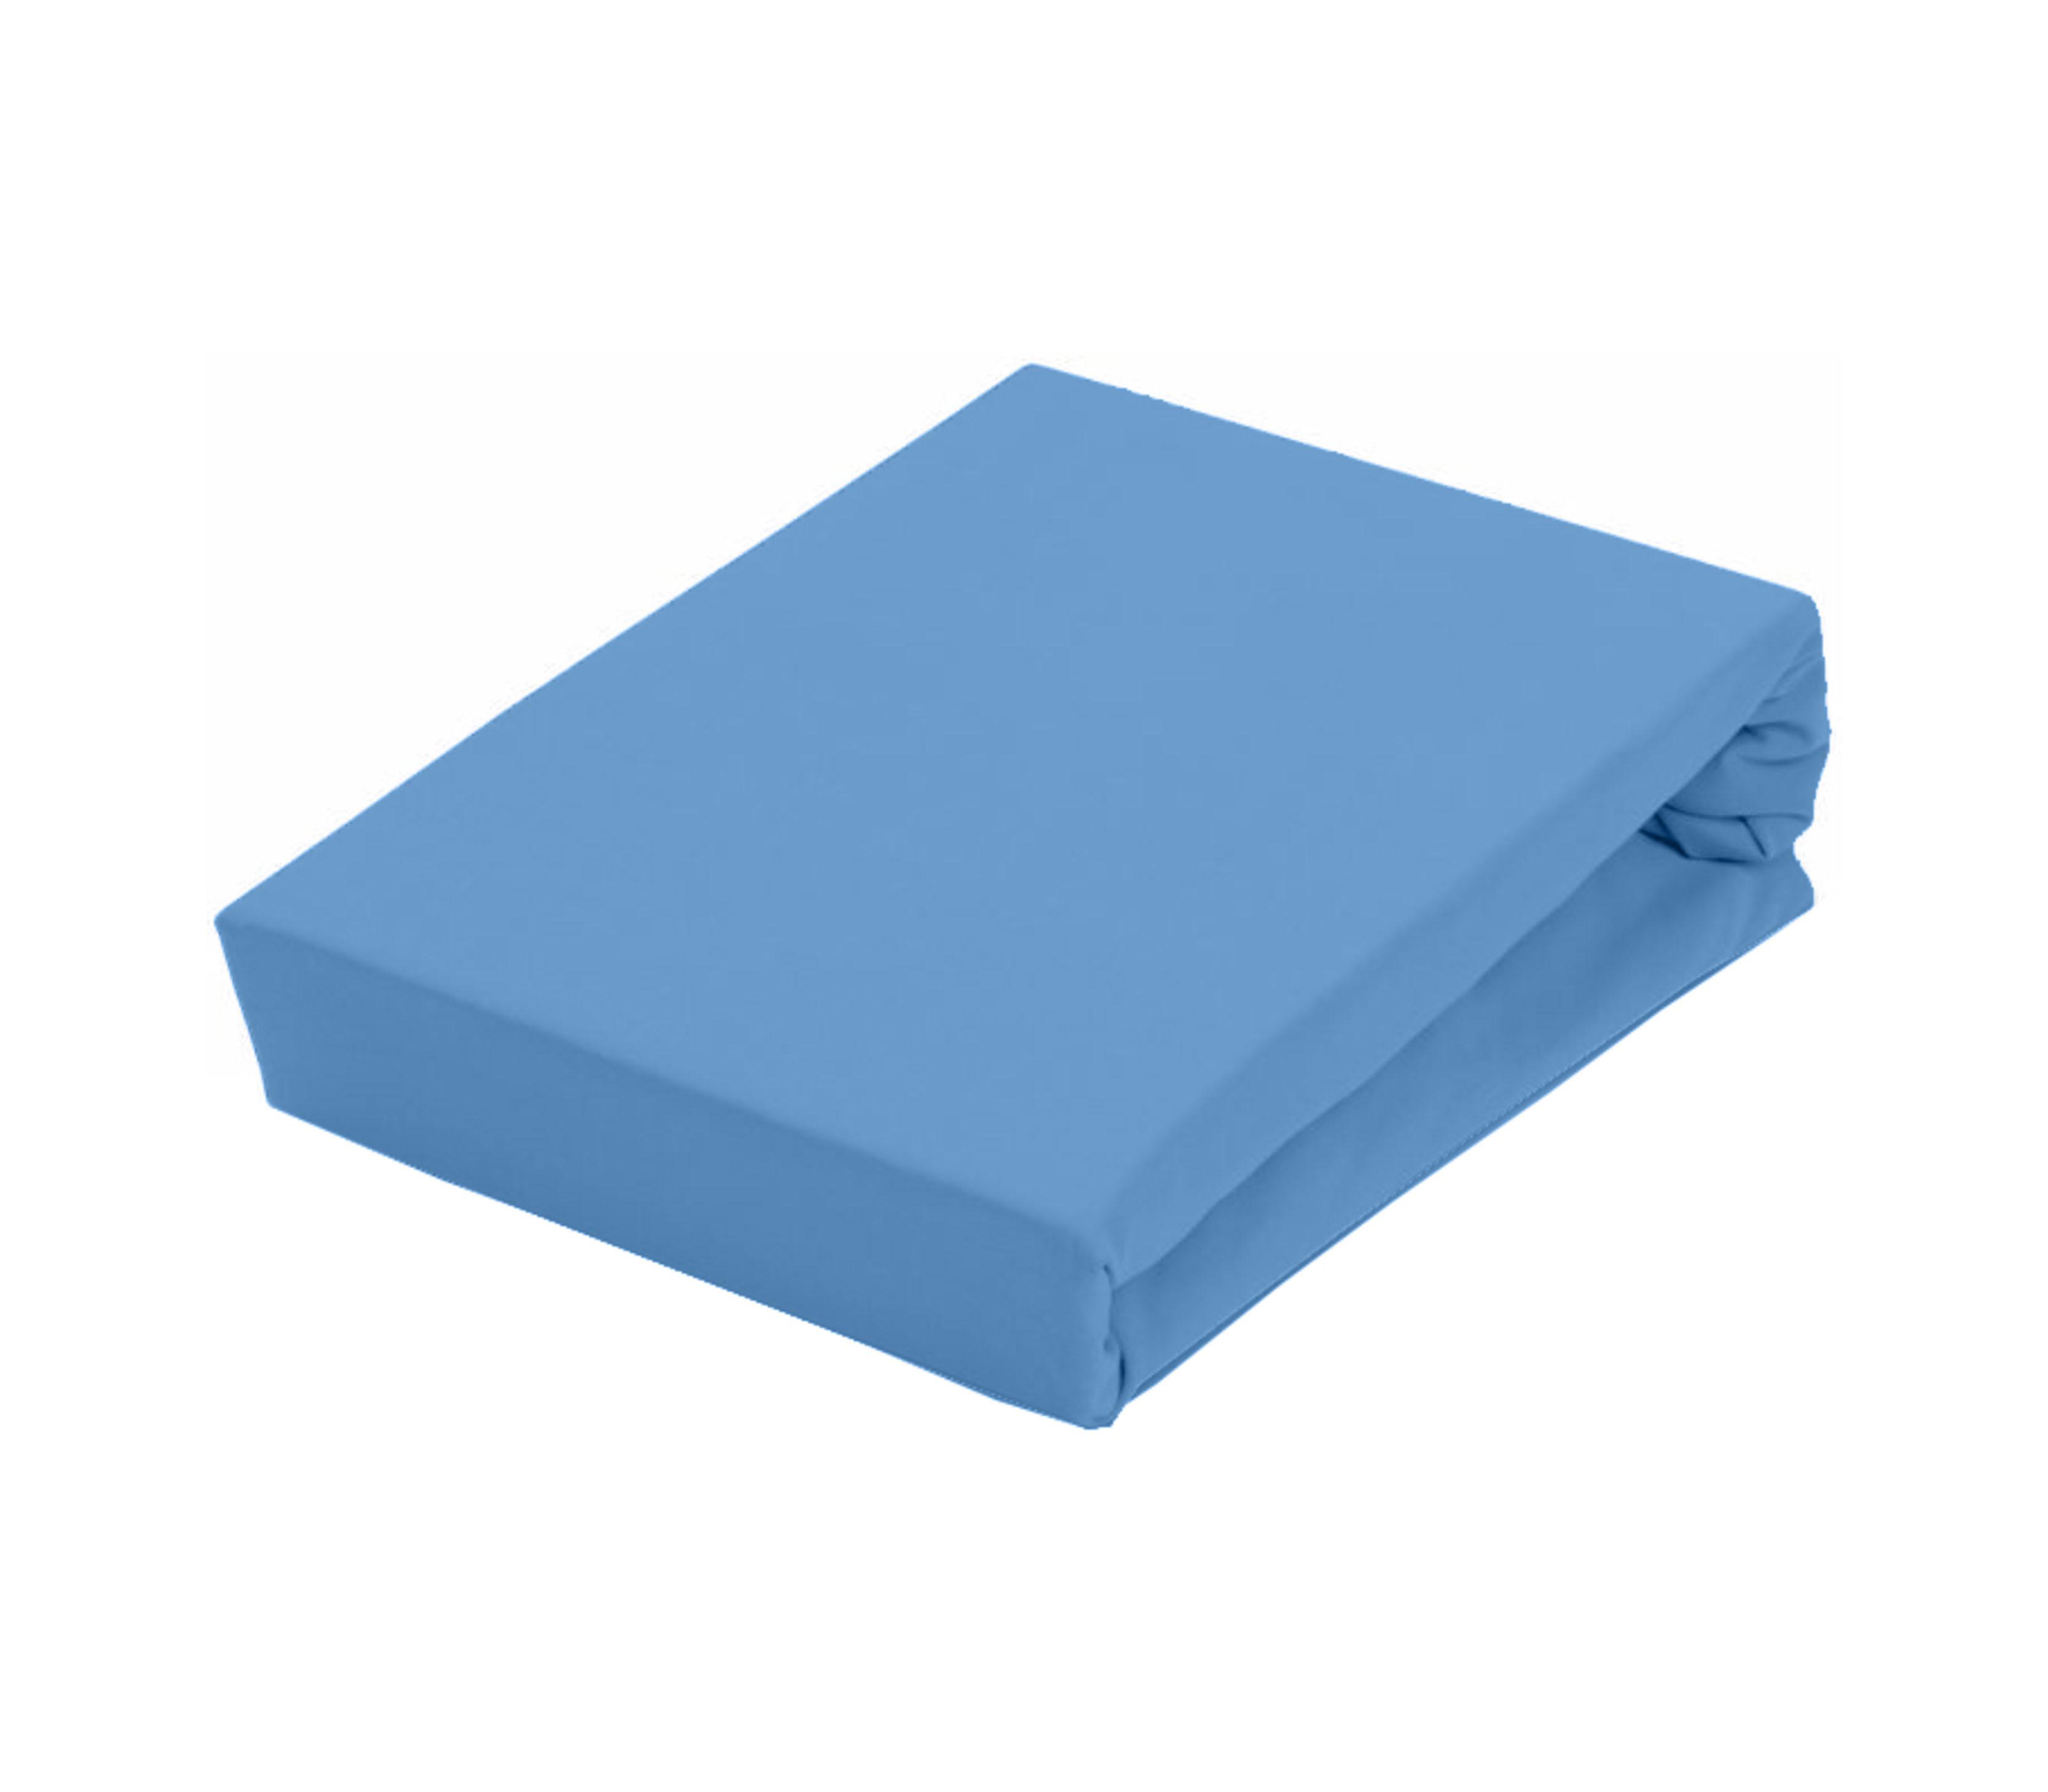 Aga Prostěradlo JERSEY 180x200 cm  Barva prostěradla: Pastelově modrá